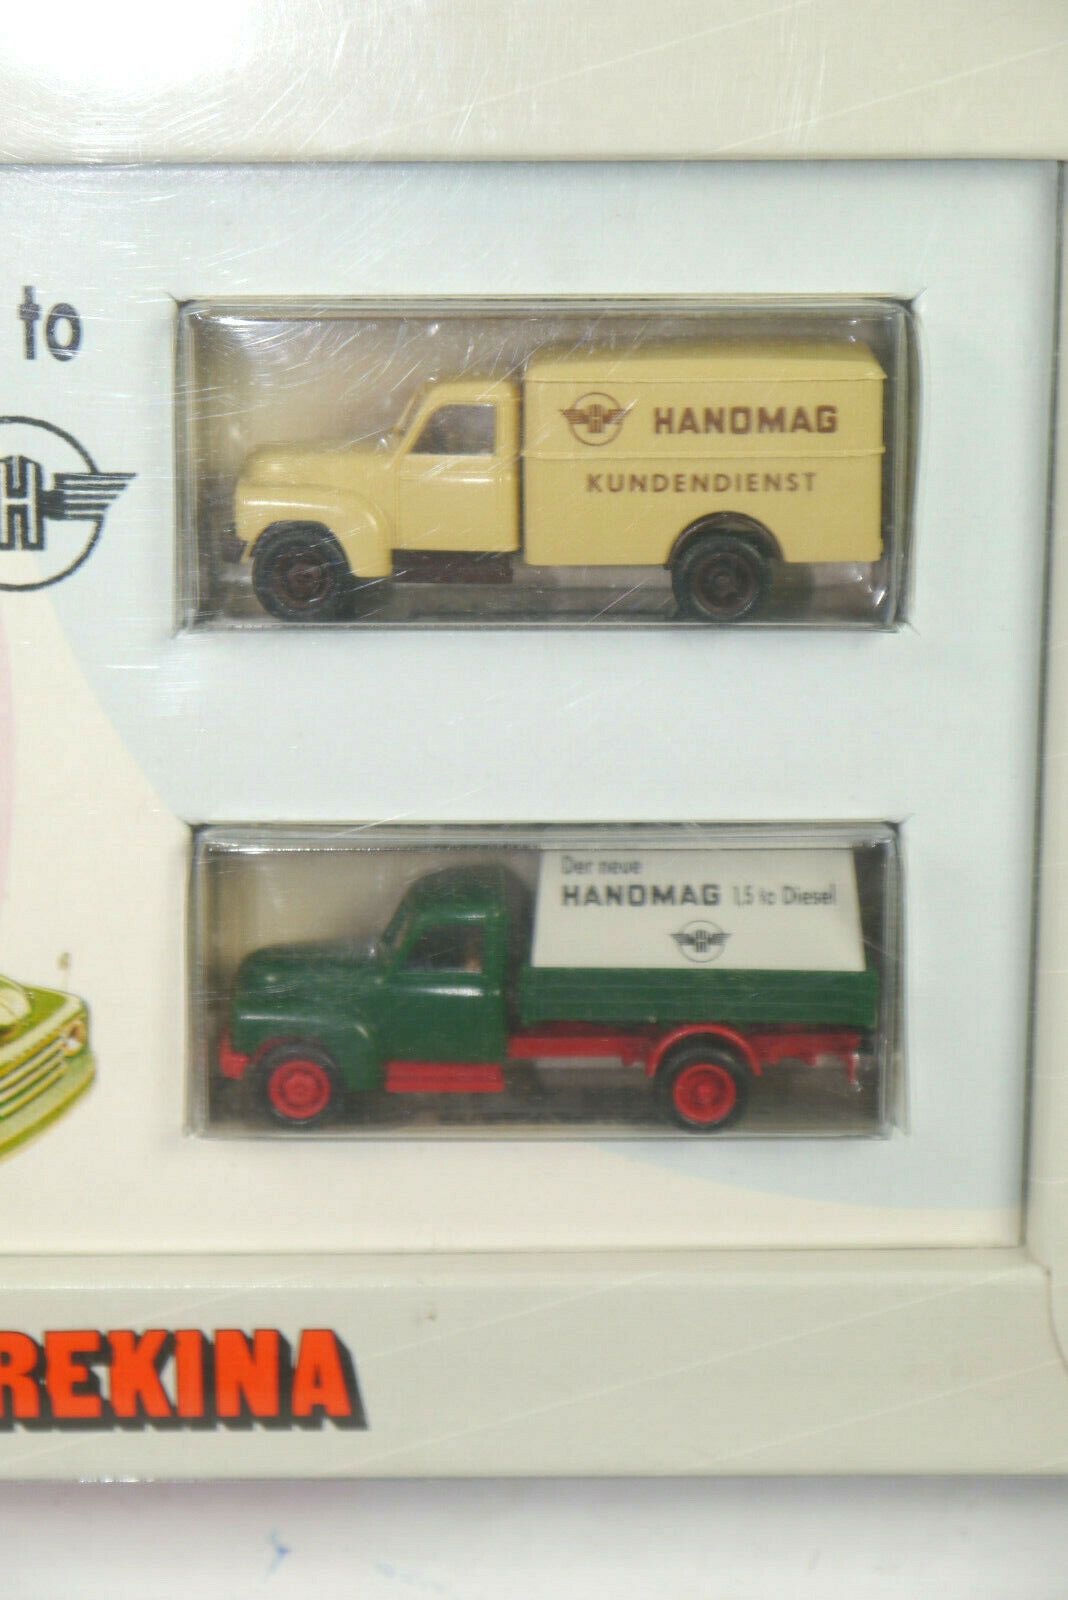 Brekina 3700 Hanomag 1,5 To To To Modellino Auto Set Servizio Clienti 1 87 (K31) f9ccb5